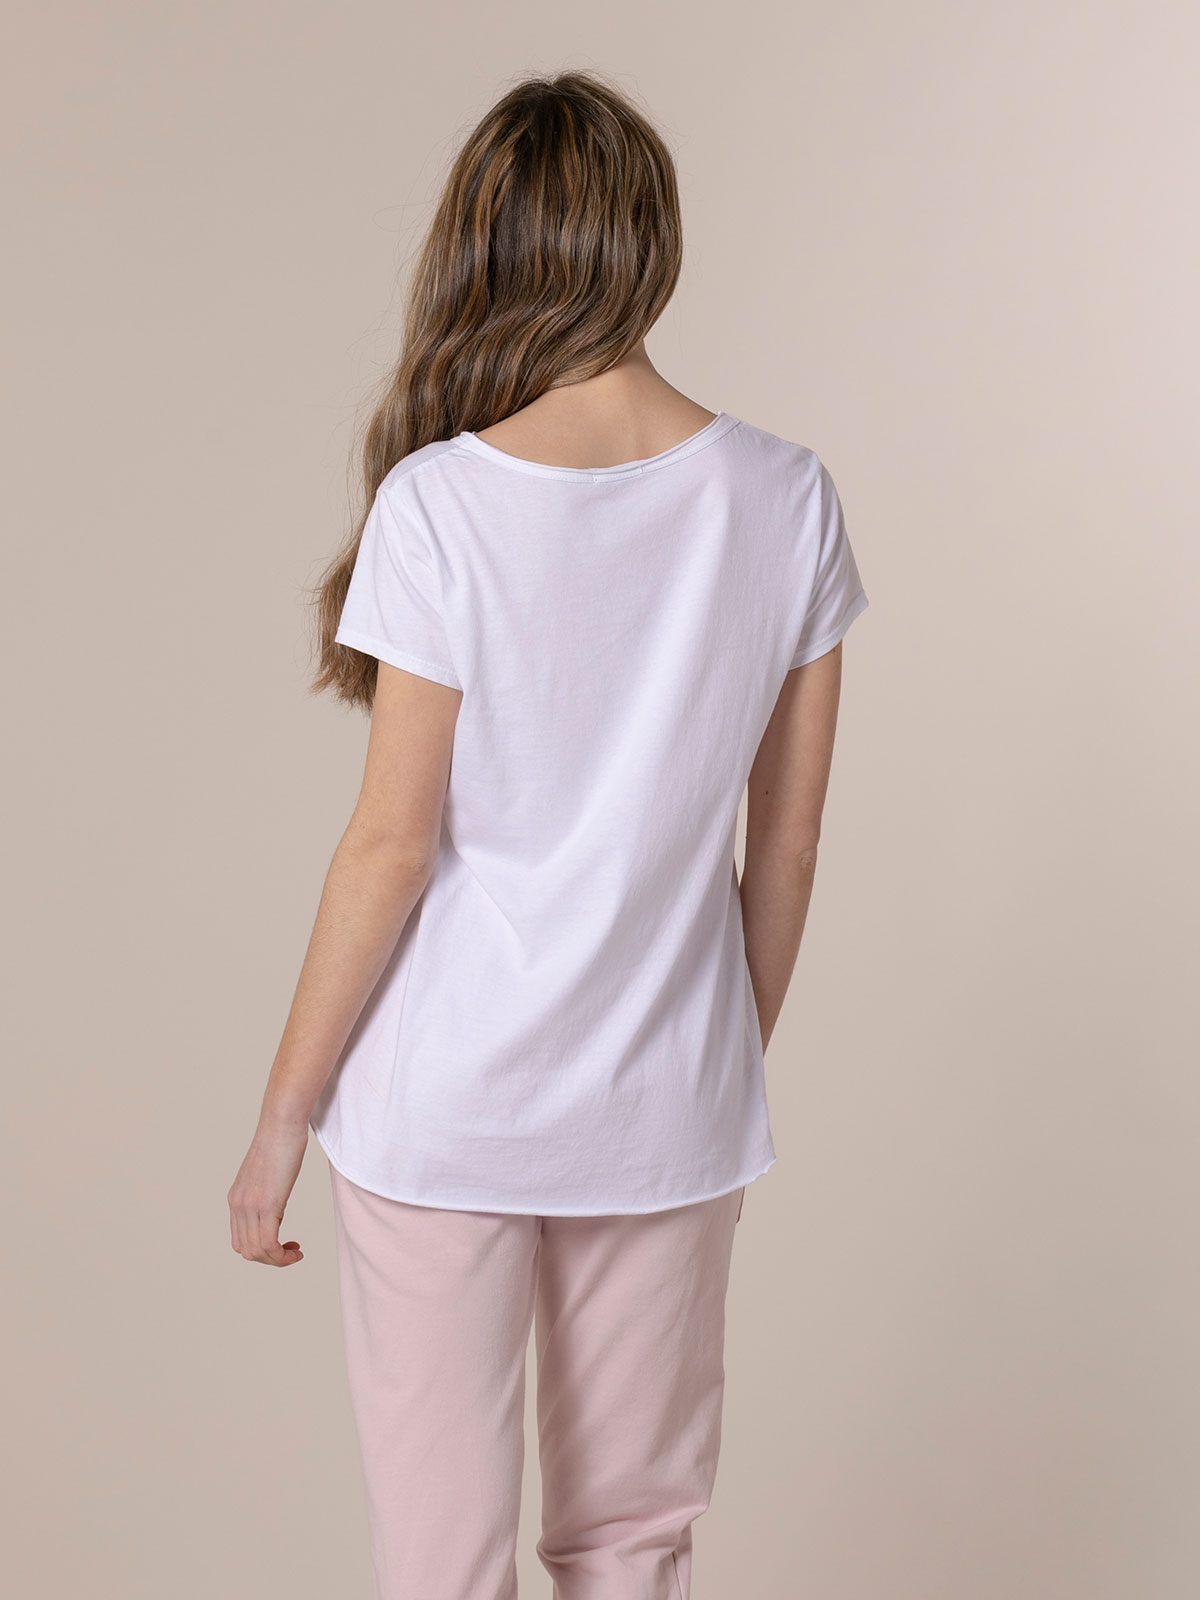 Camiseta mujer lisa algodón Blanco